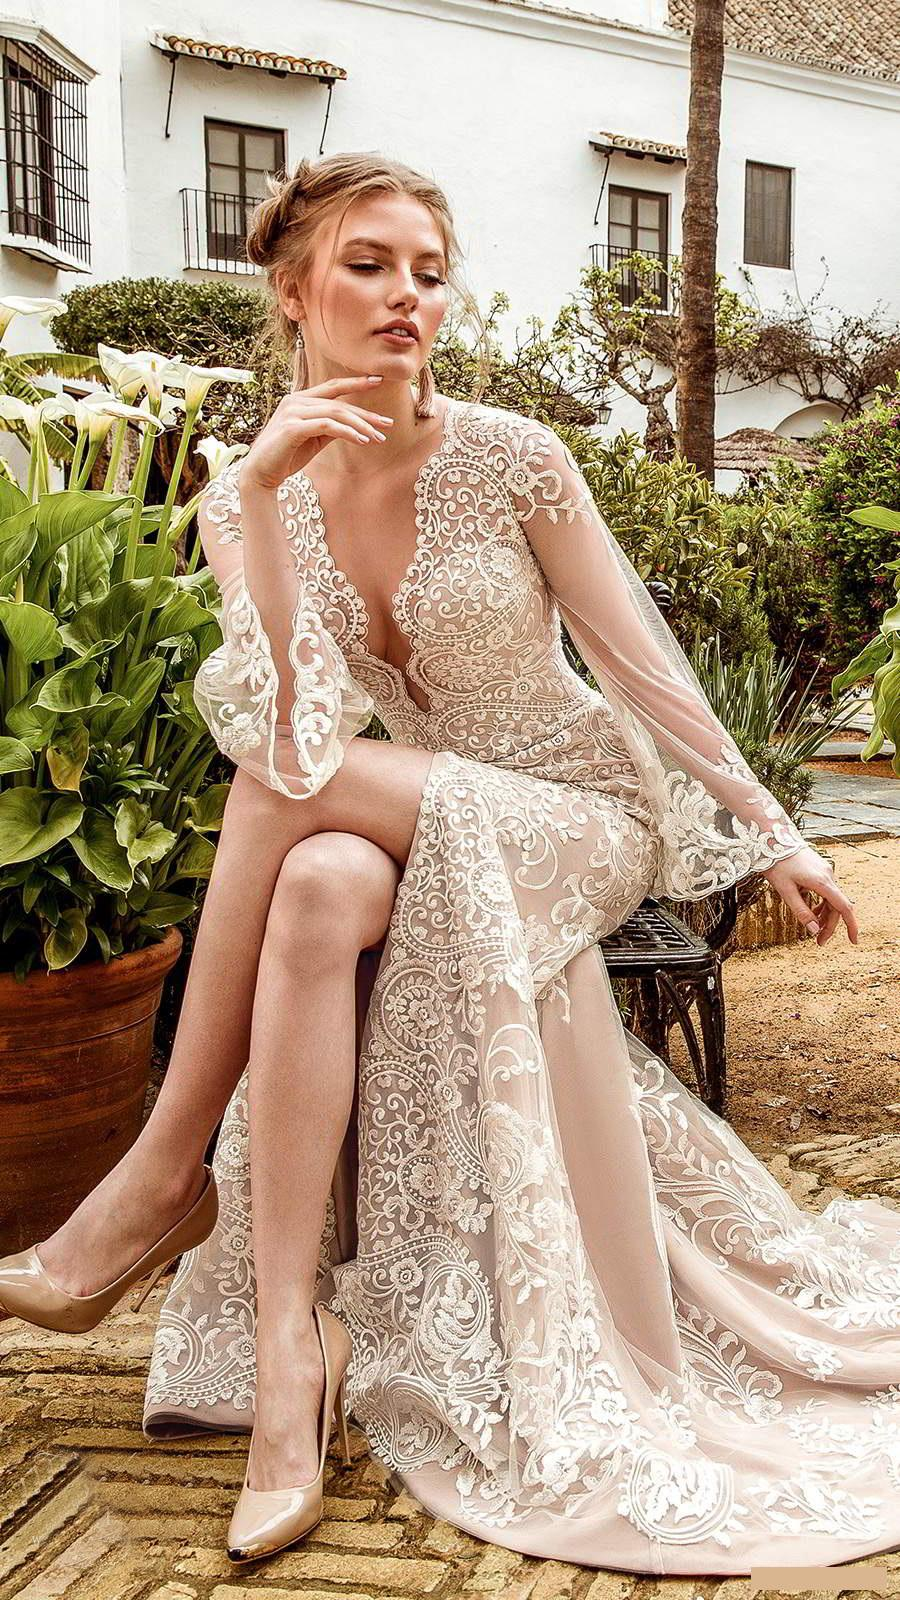 Wedding Dresses Sheath Column Bridal Long Sleeves Gowns Appliques V Neck Size 4 6 8 10 12 14 16 18 20 22 24